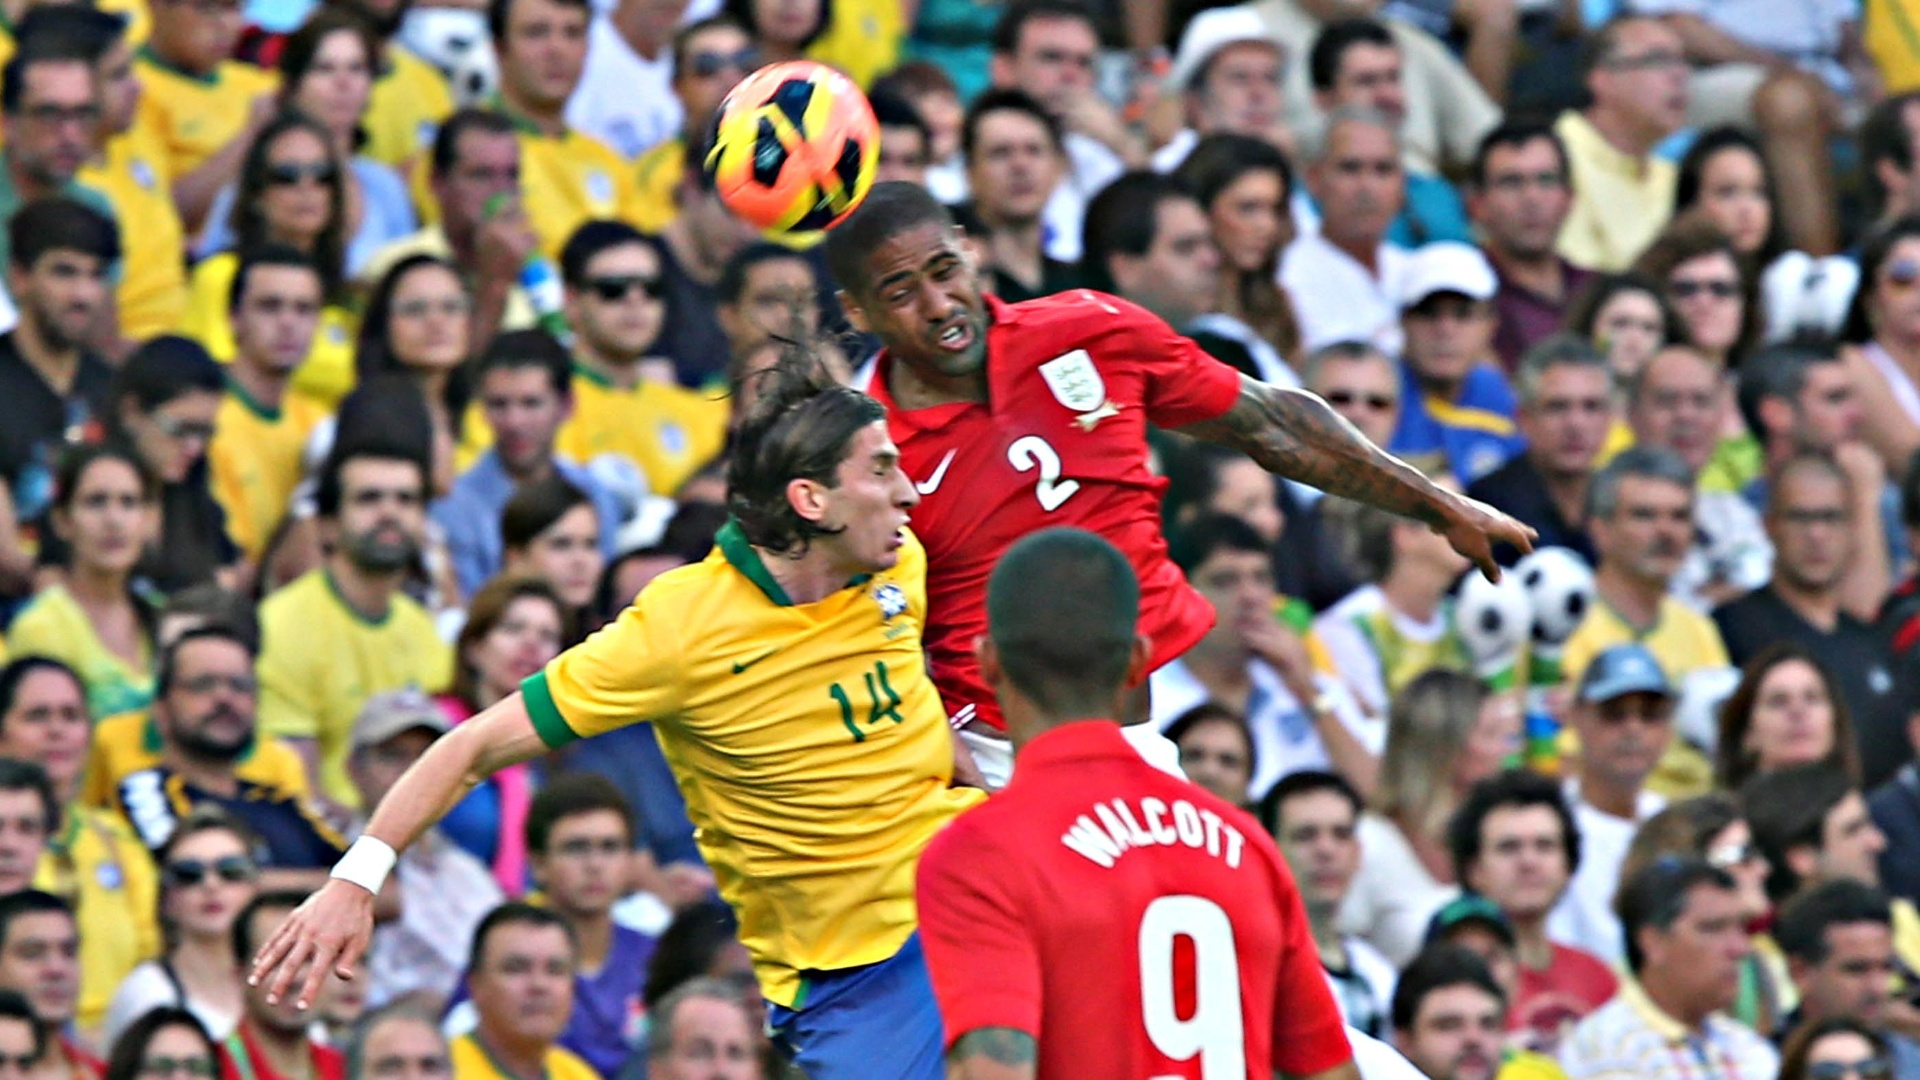 02.jun.2013 - Filipe Luiz disputa bola aérea com zagueiros da Inglaterra durante amistoso no Maracanã